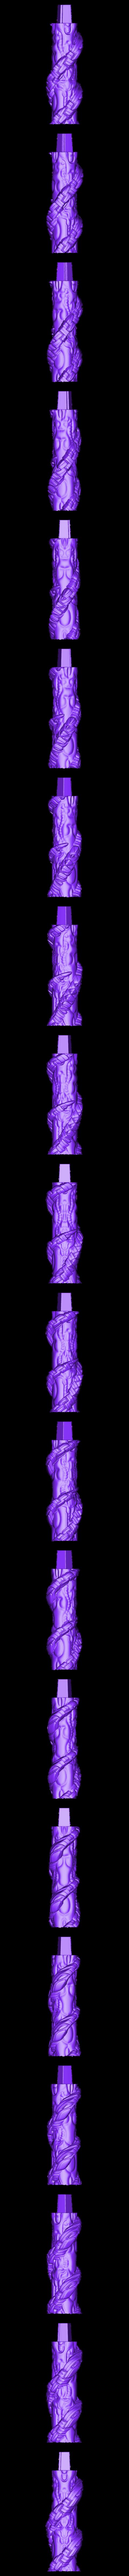 Aquaman_weapon_06.stl Download STL file Aquaman Trident Cosplay STL files - Costume Weapons 3D Printing • 3D printing design, 3DPrintModelStoreSS